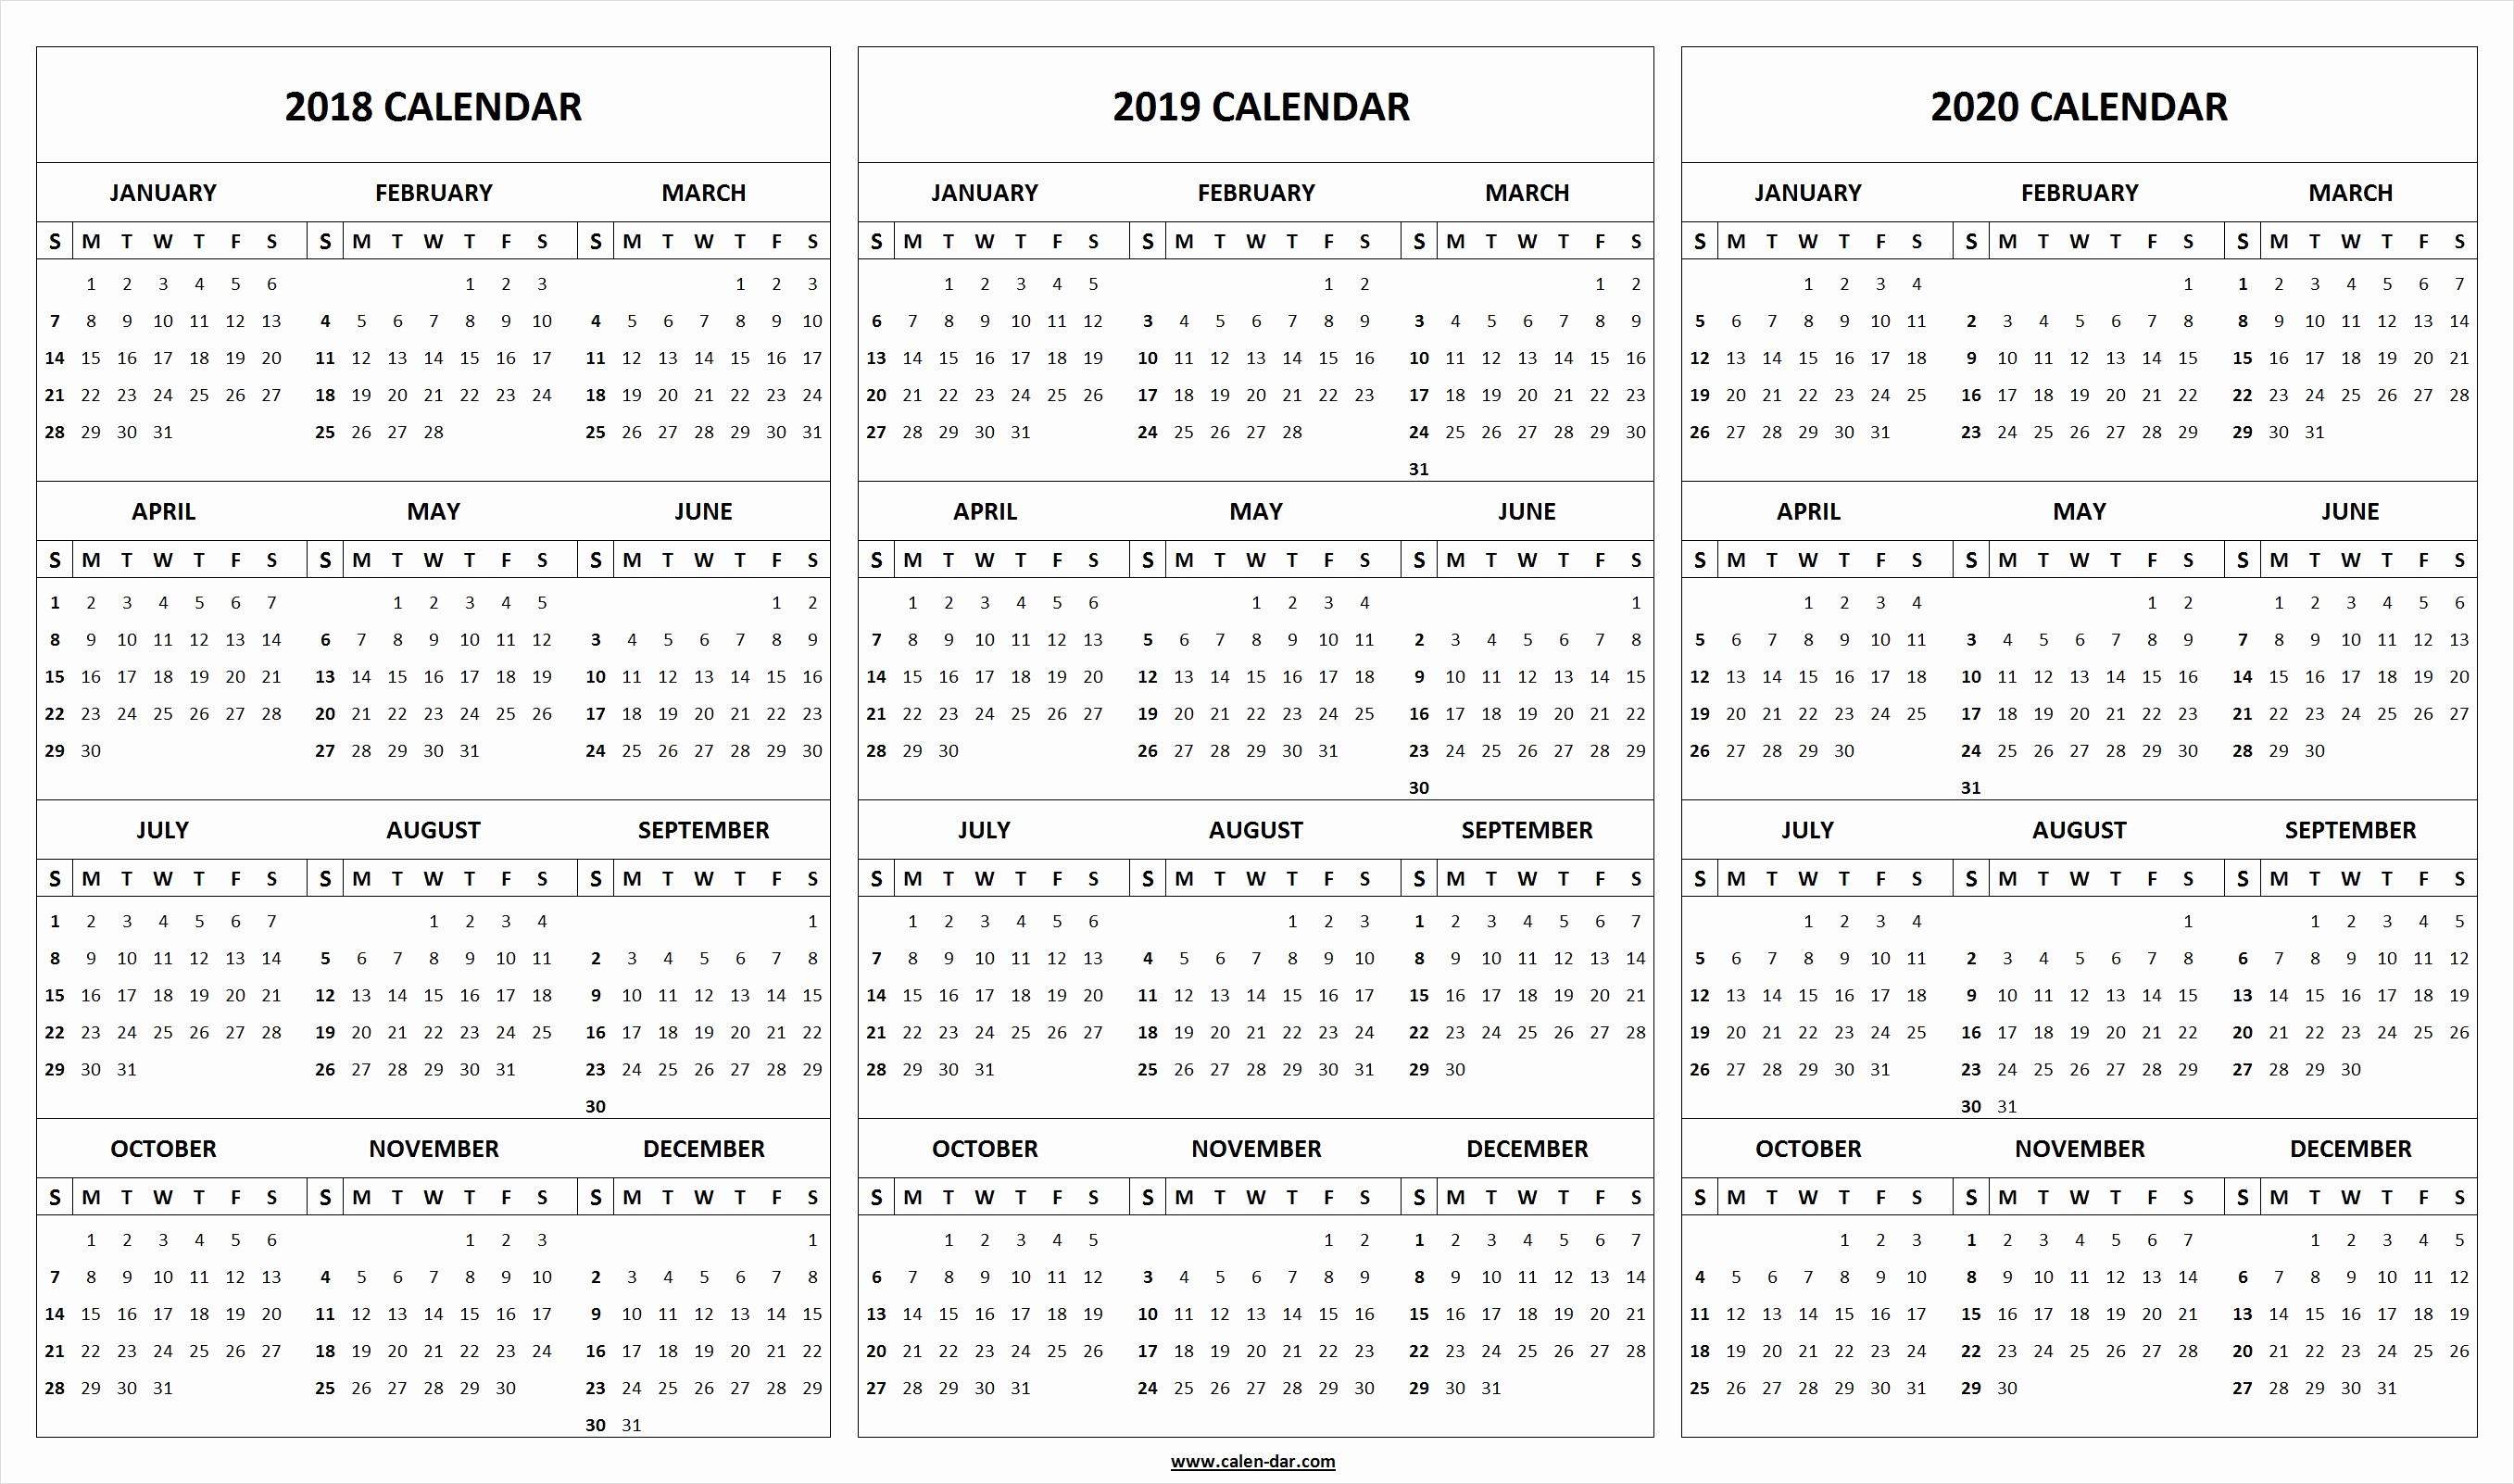 2019 and 2020 Calendar Printable New Printable 2018 2019 2020 Calendar Template